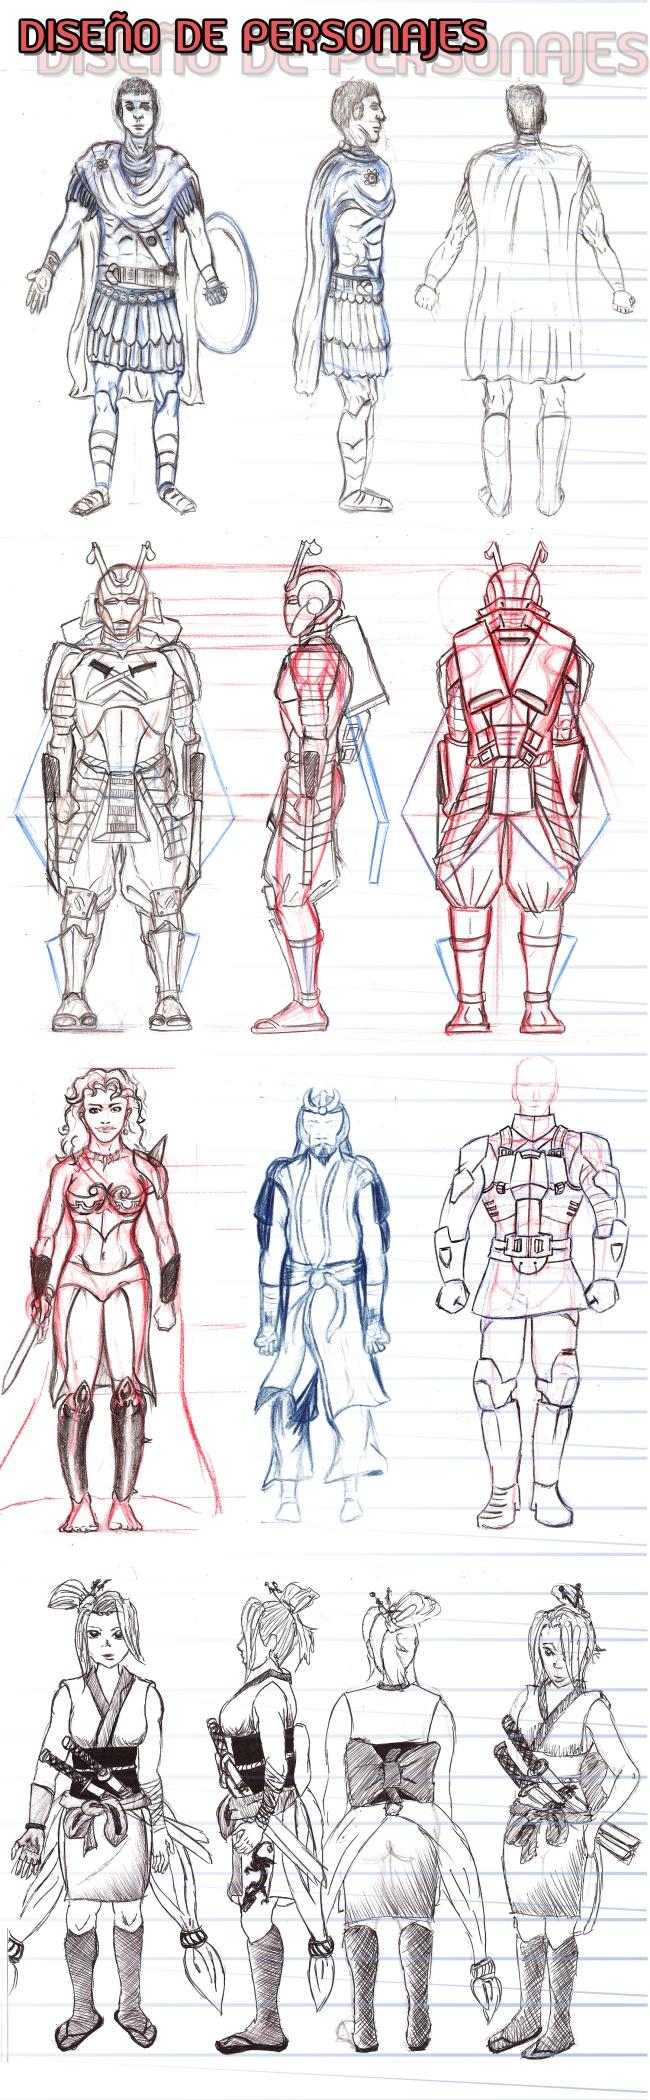 hojas-modelo-personajes-comic-masterc10-academiac10-verano-niños